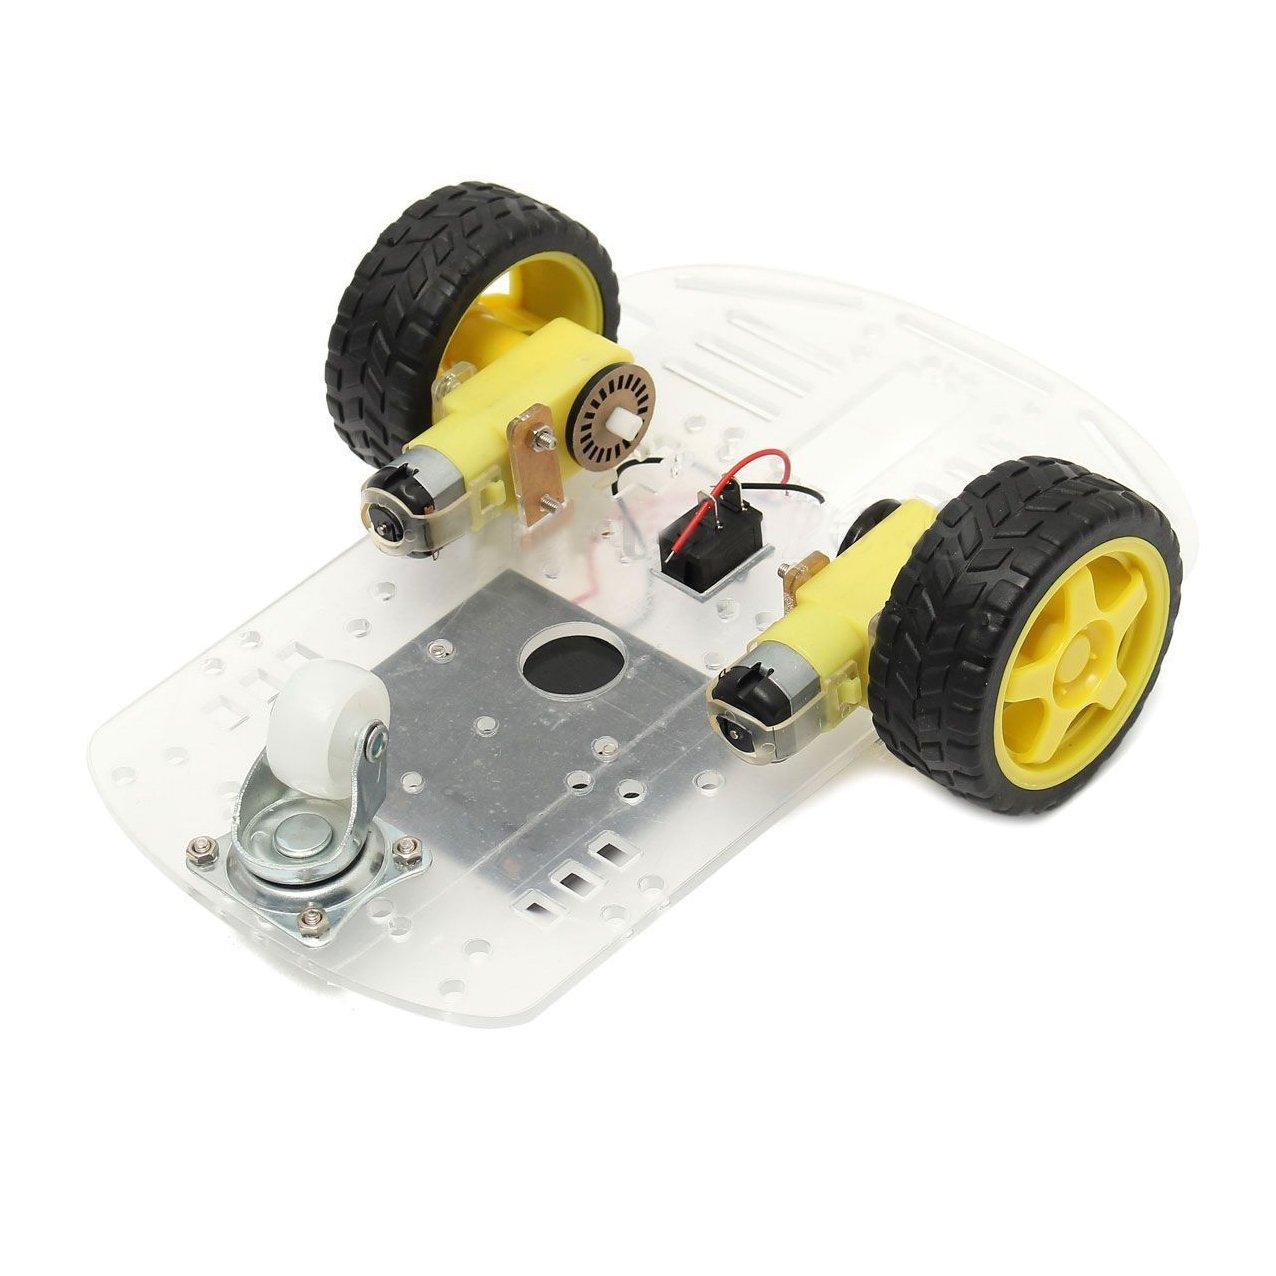 Automotive Gehaeuse Set Neu 2WD Smart Motor Roboter Auto Fahrgestelle Batterie Box Set Drehzahlgeber fuer Arduino SODIAL R